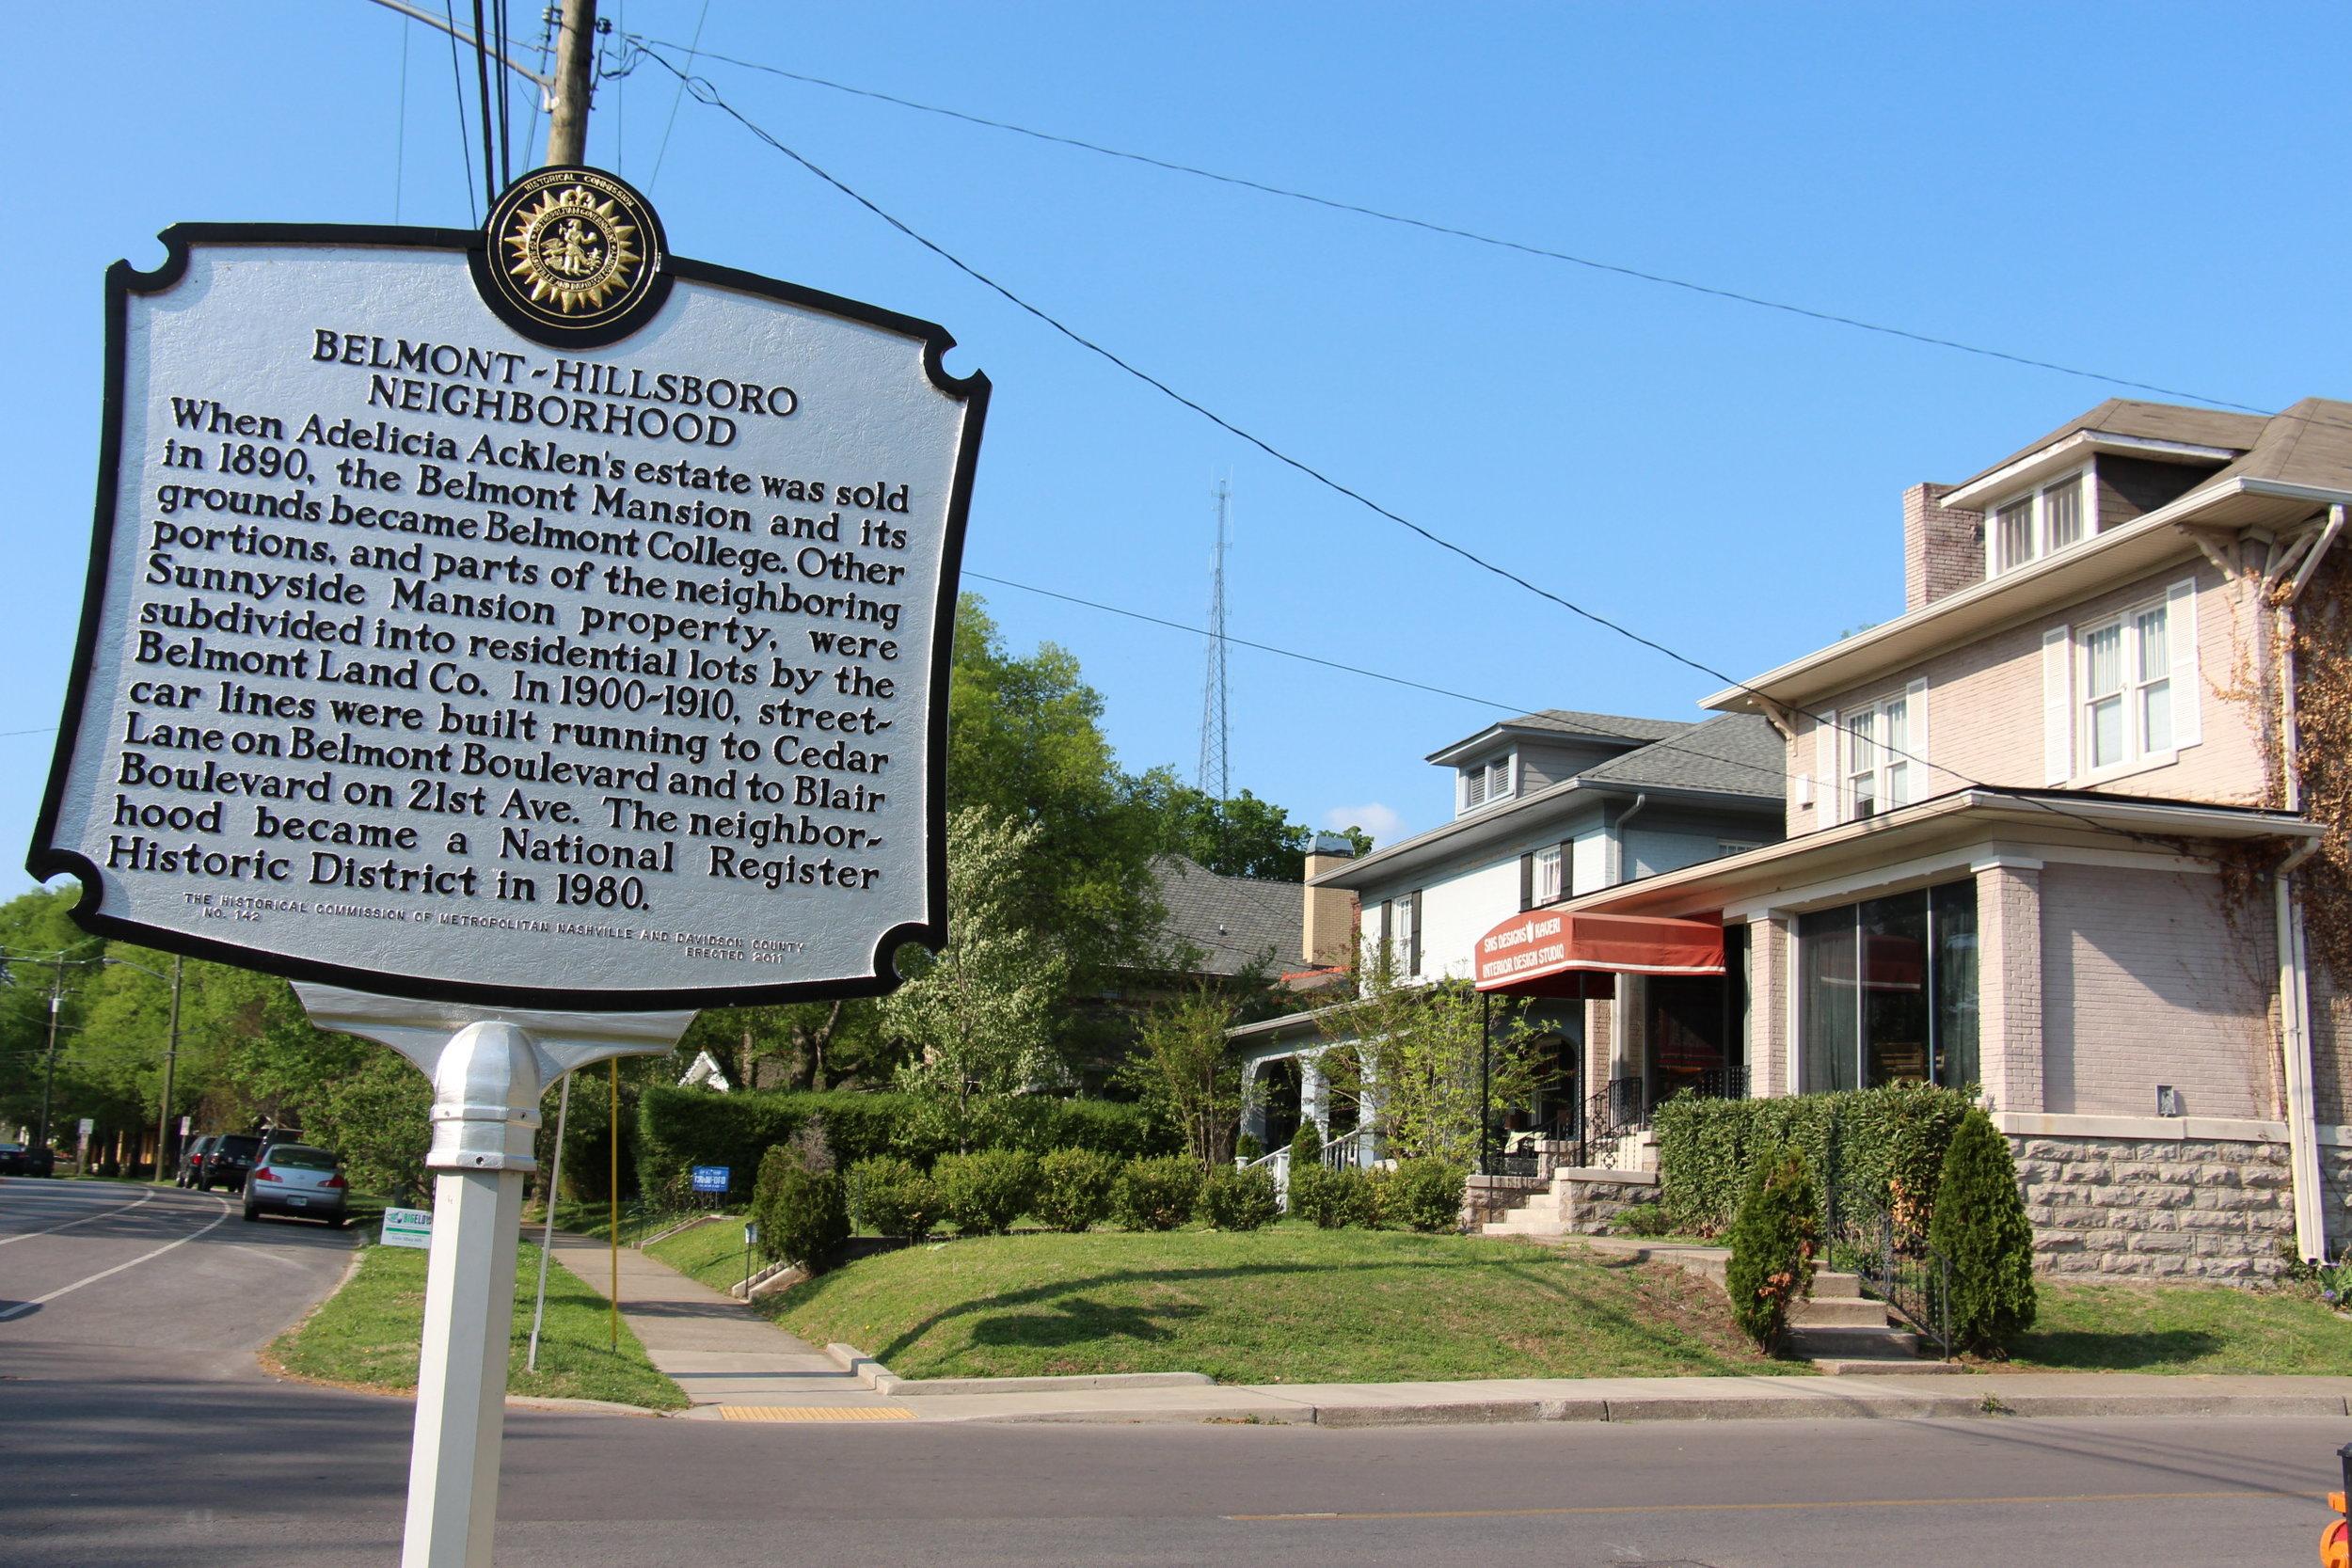 belmont-hillsboro-neighborhood.jpg